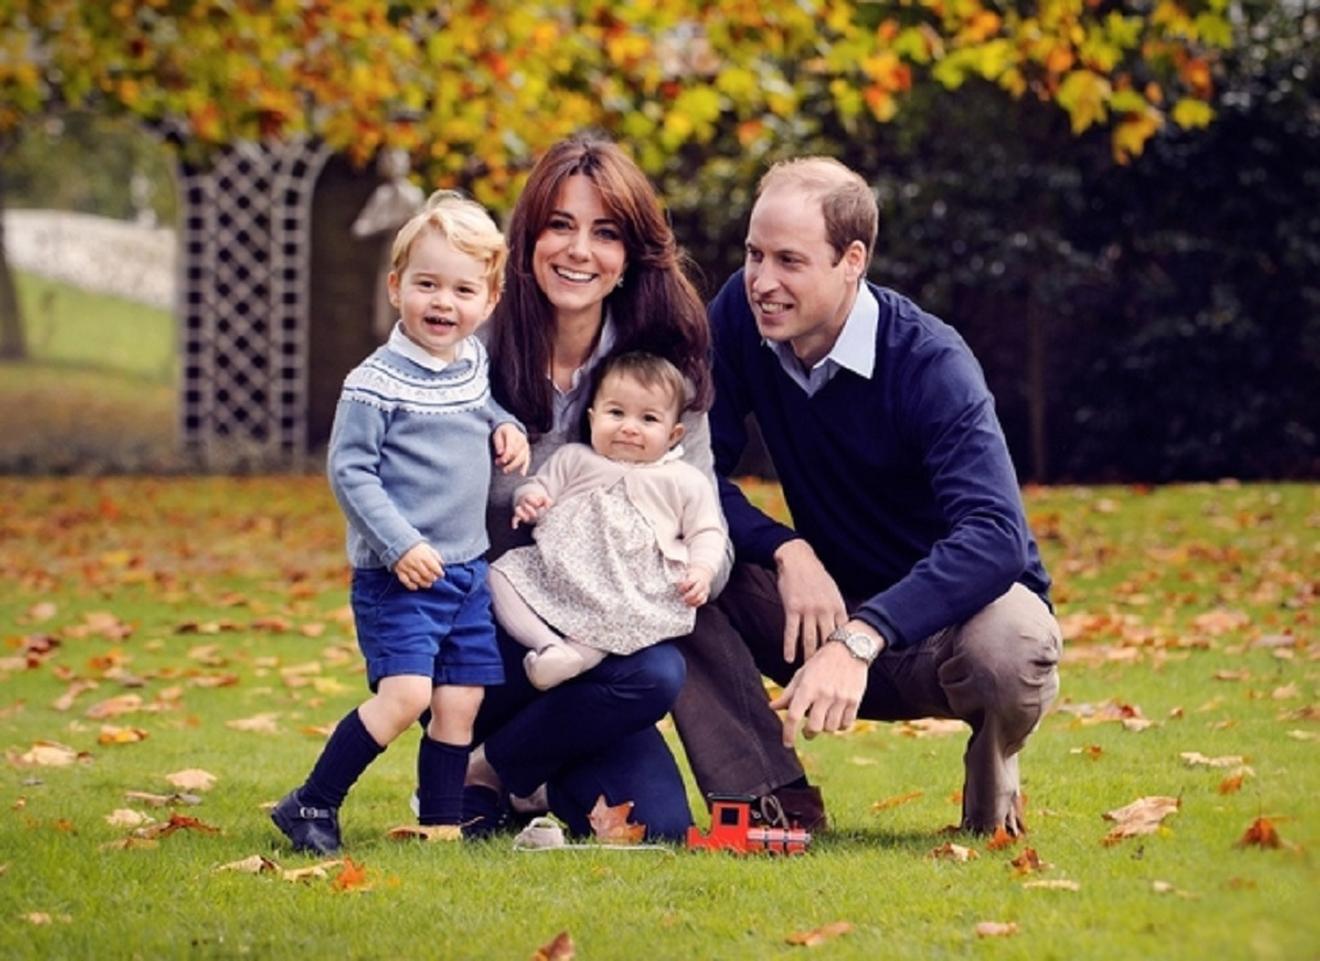 Vojvotkinja stvara sjajne porodične uspomene